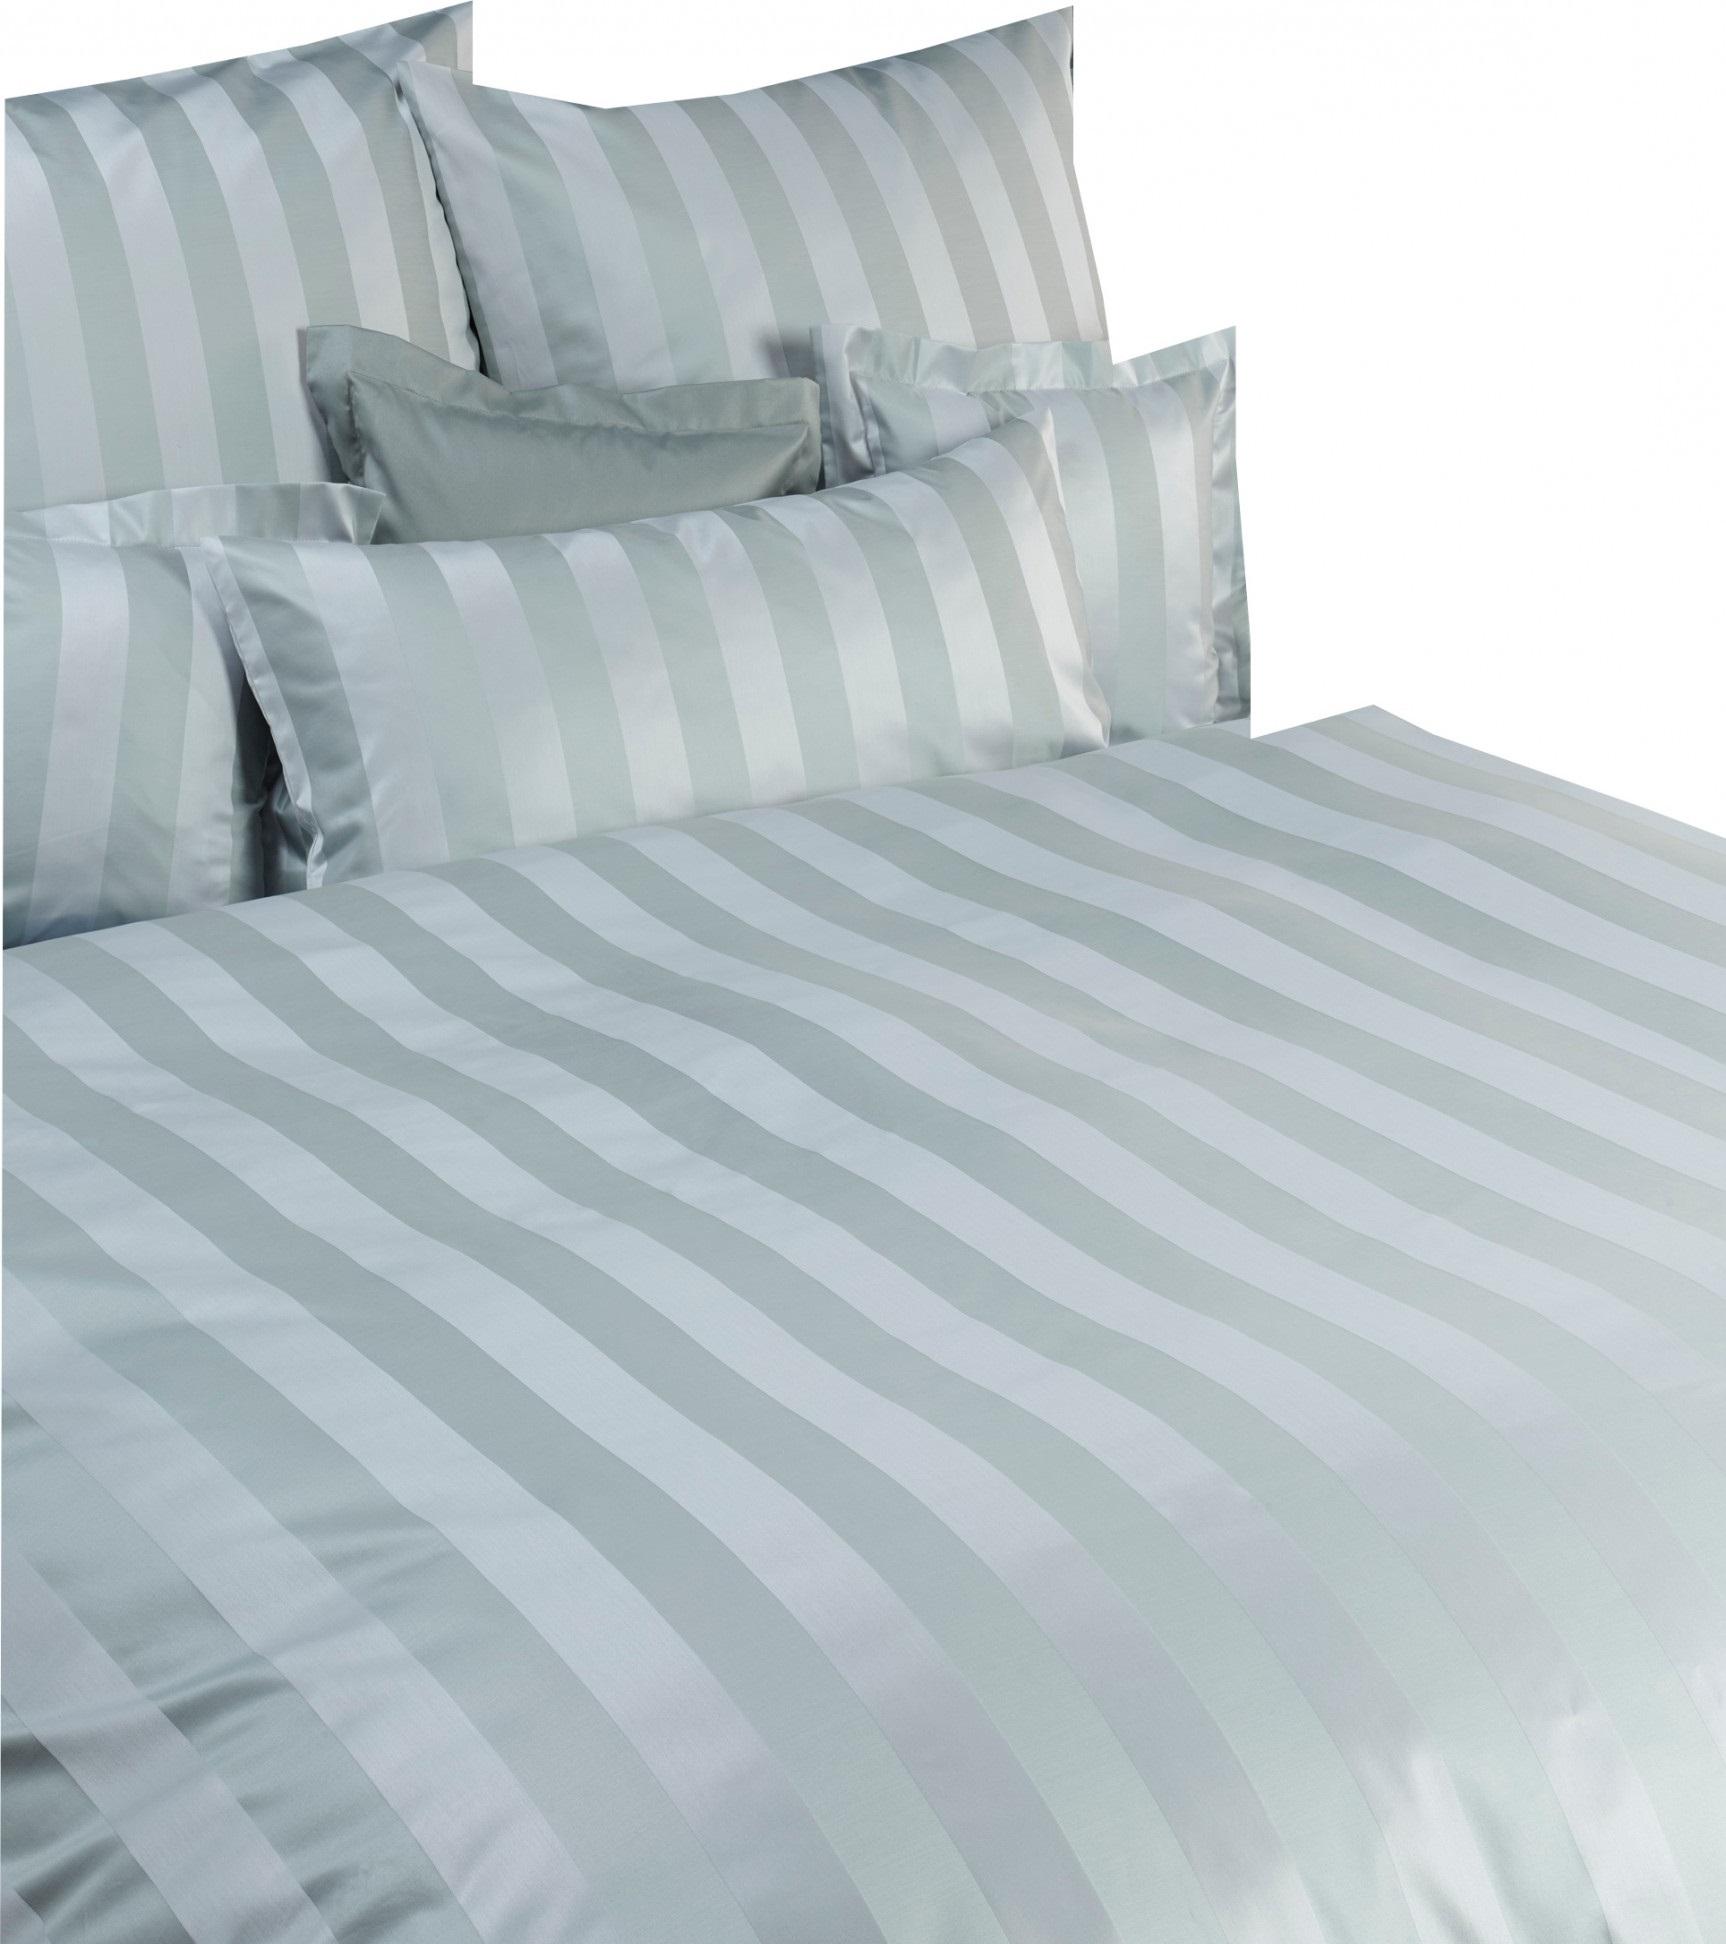 curt bauer mako damast bettw sche como gr e 155x220 80x80 cm farbe schilf bettw sche bettw sche. Black Bedroom Furniture Sets. Home Design Ideas